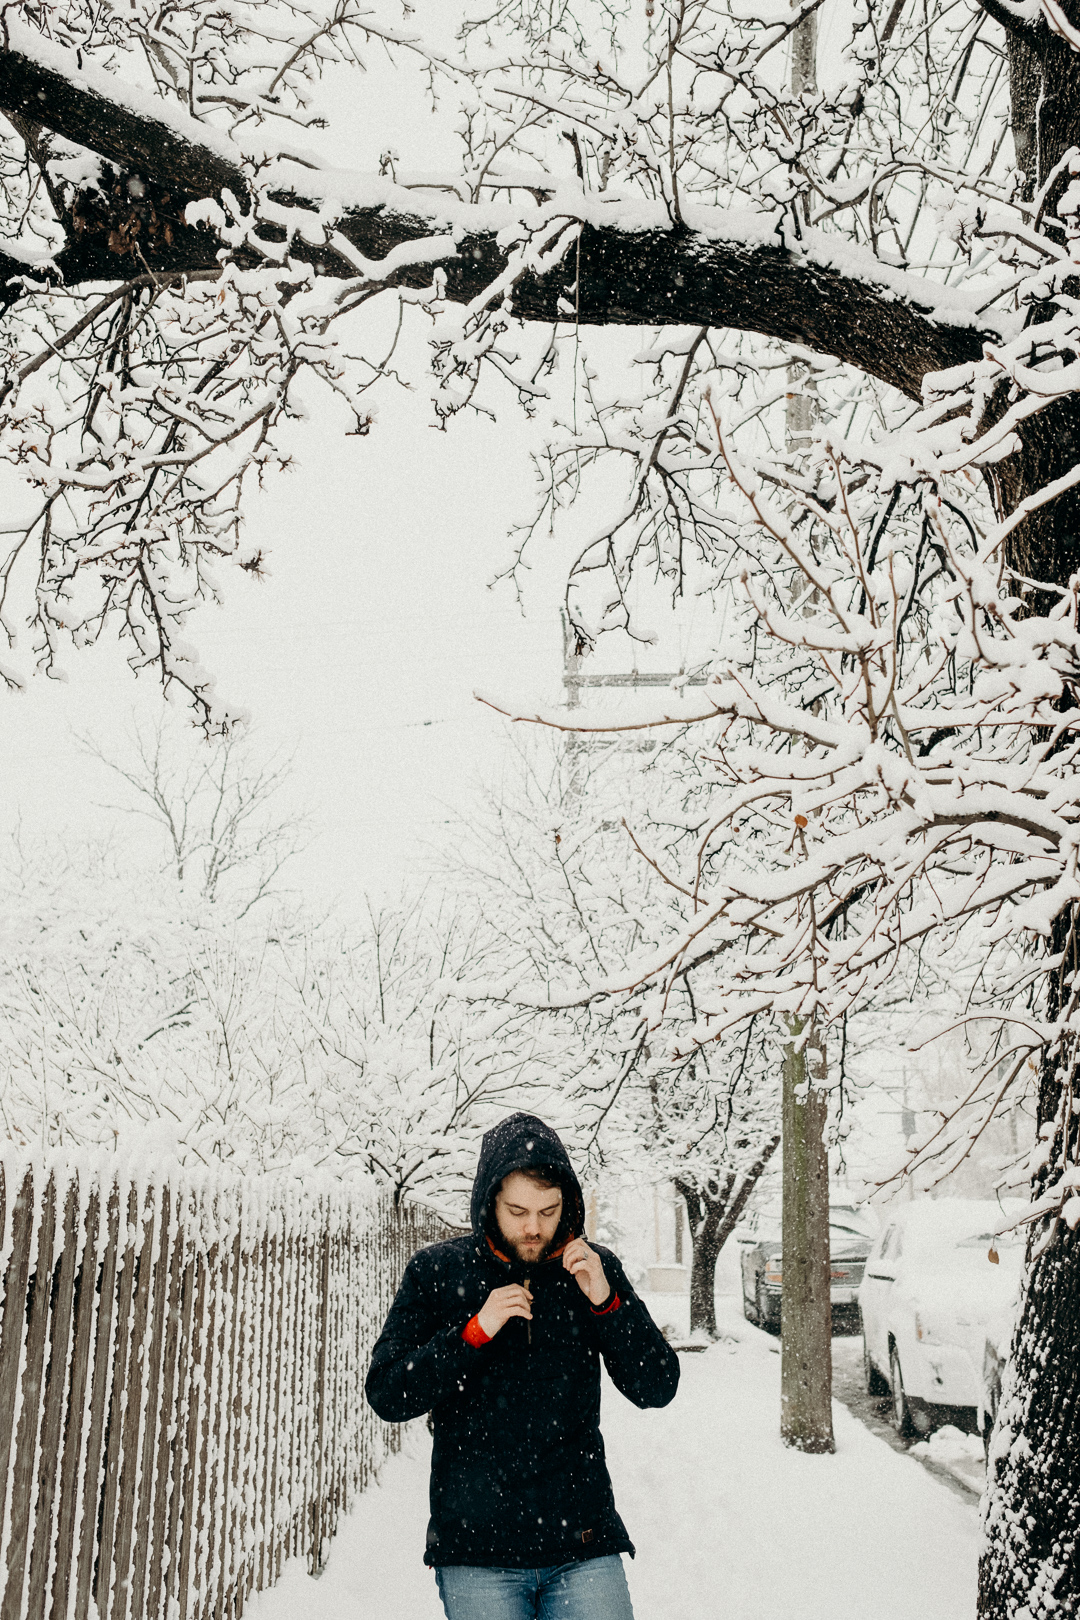 20190112_snowydaysin_kansascity_alihapperphoto_7.jpg